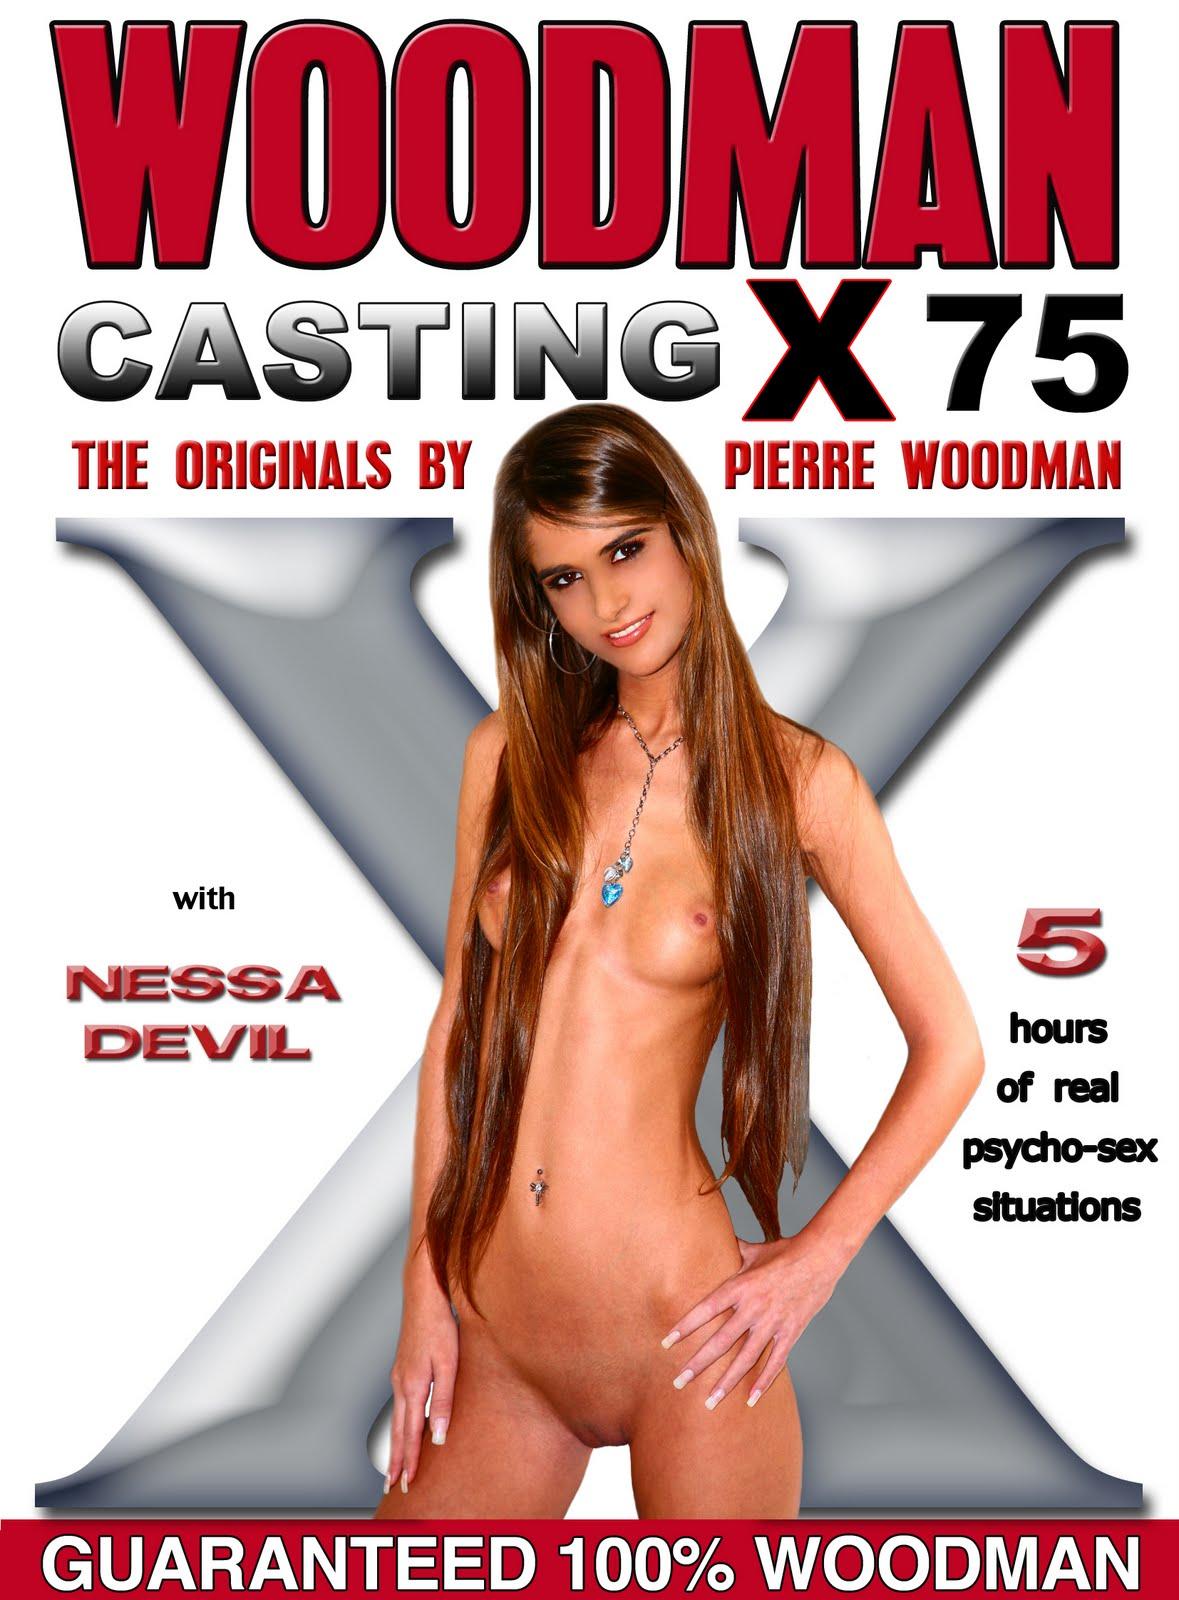 Nessa devil casting